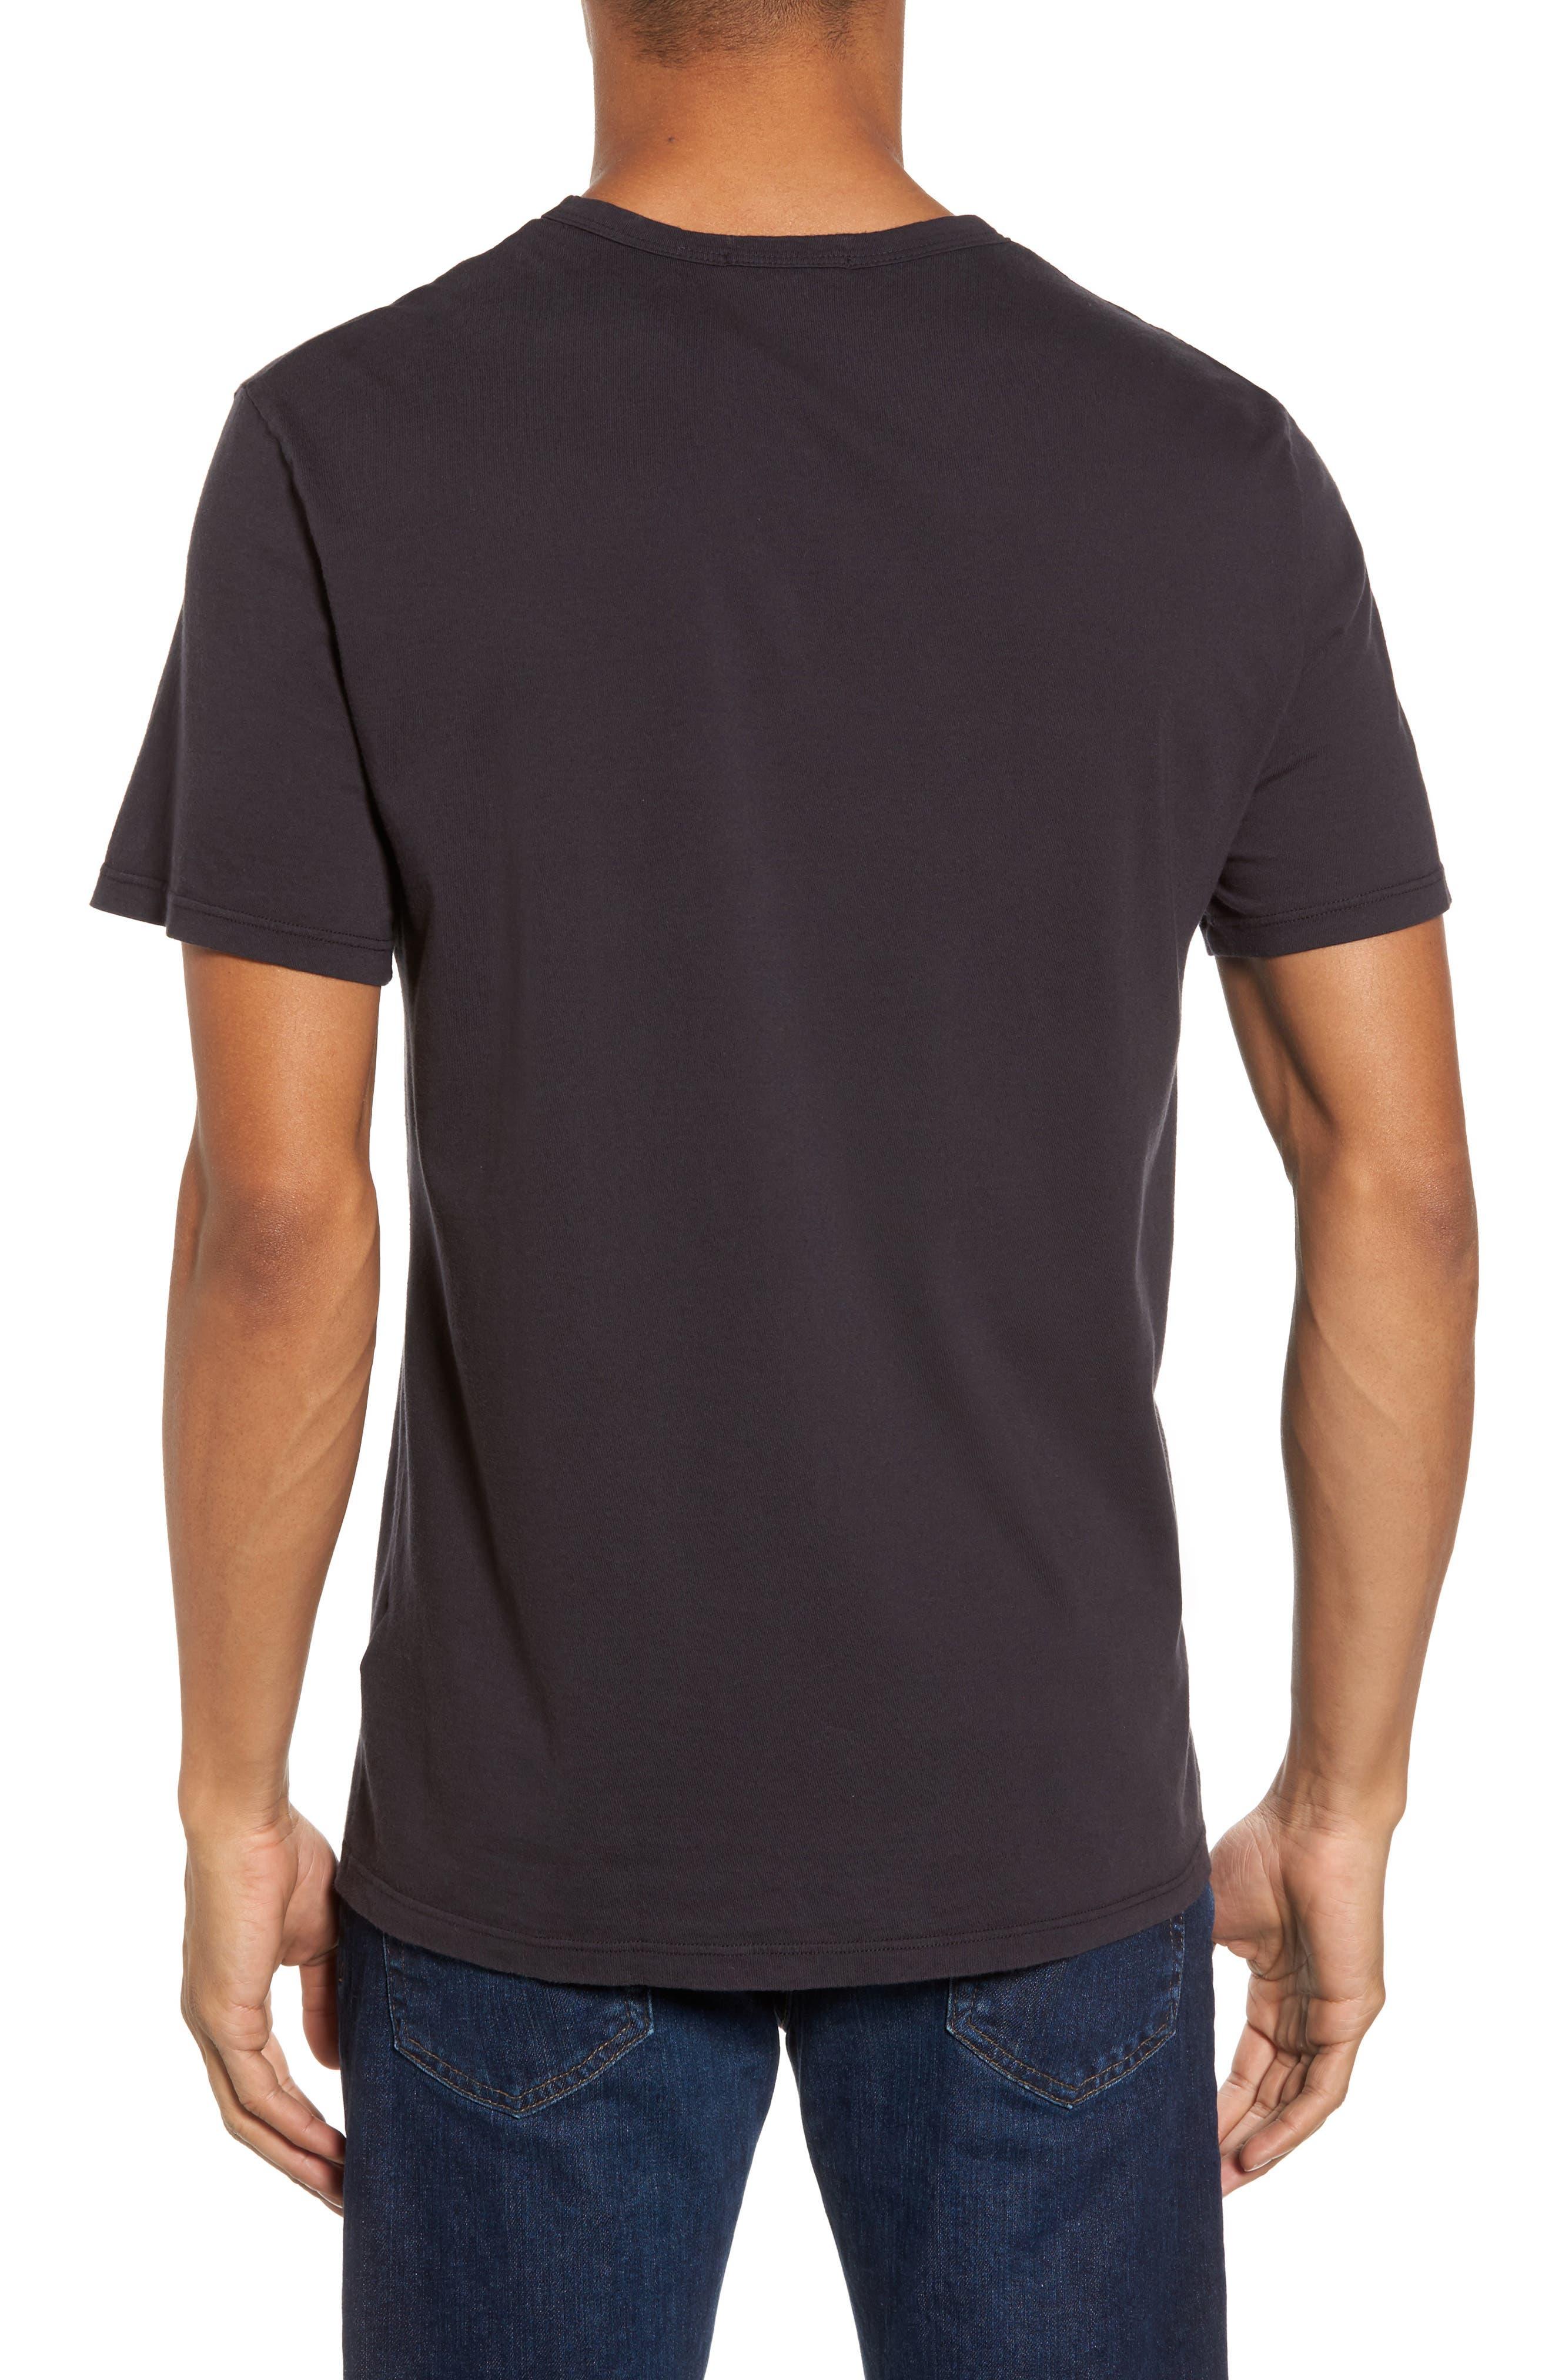 Suvin Crewneck T-Shirt,                             Alternate thumbnail 2, color,                             Squid